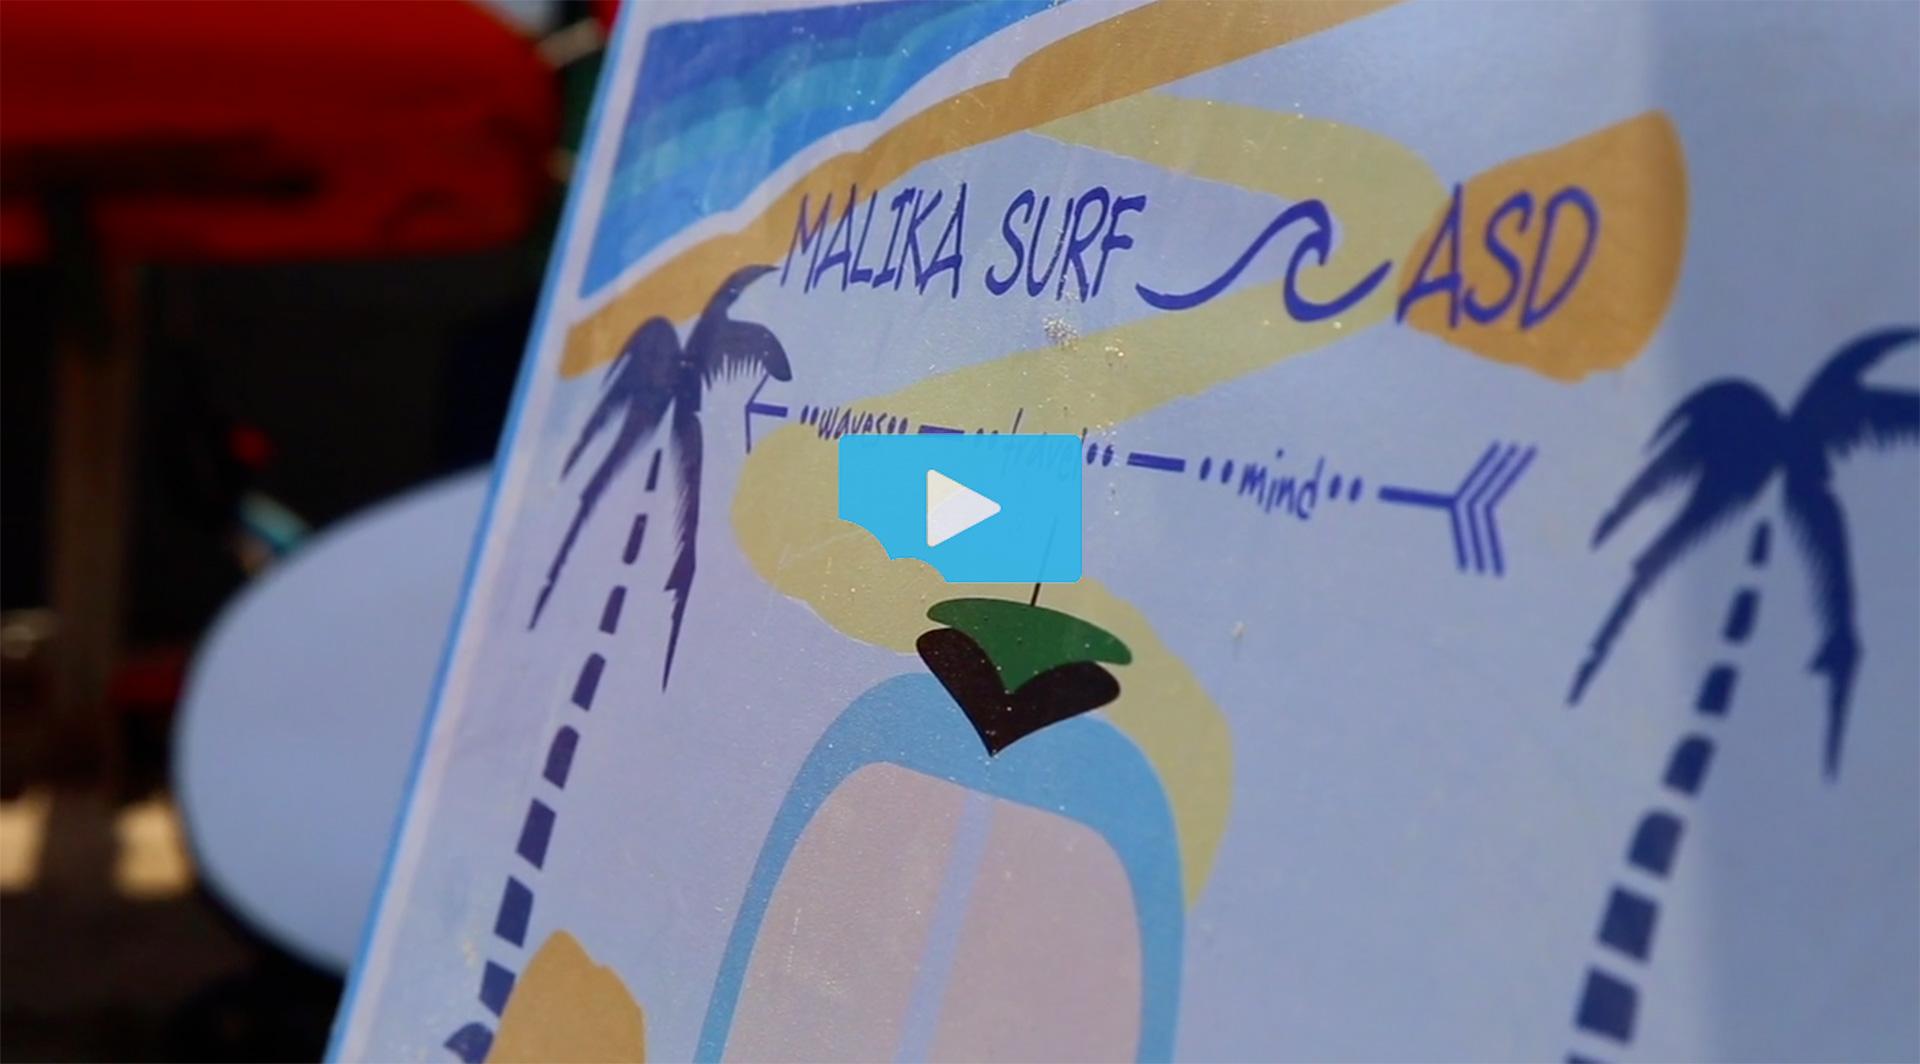 video-malika_surf_school-asd-yoga-sup-camp-training-equilibrium-Filippo_Lera-Gioia_Uliana-web-flera_project